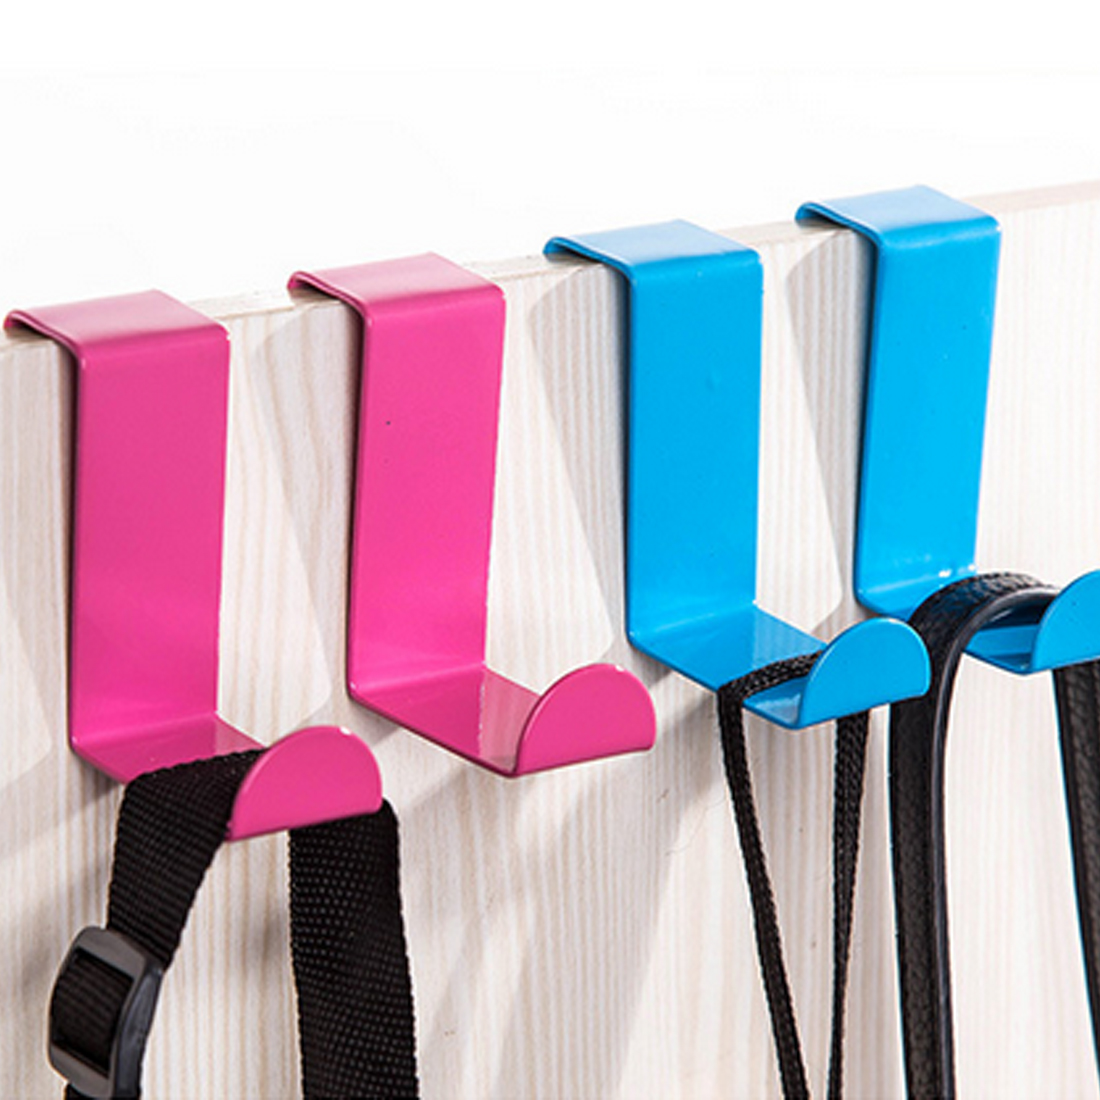 2pcs/set Stainless Steel Cabinet Door Drawer Hooks Clothes Hanger Towel Holder Home Organizer Kitchen Accessories